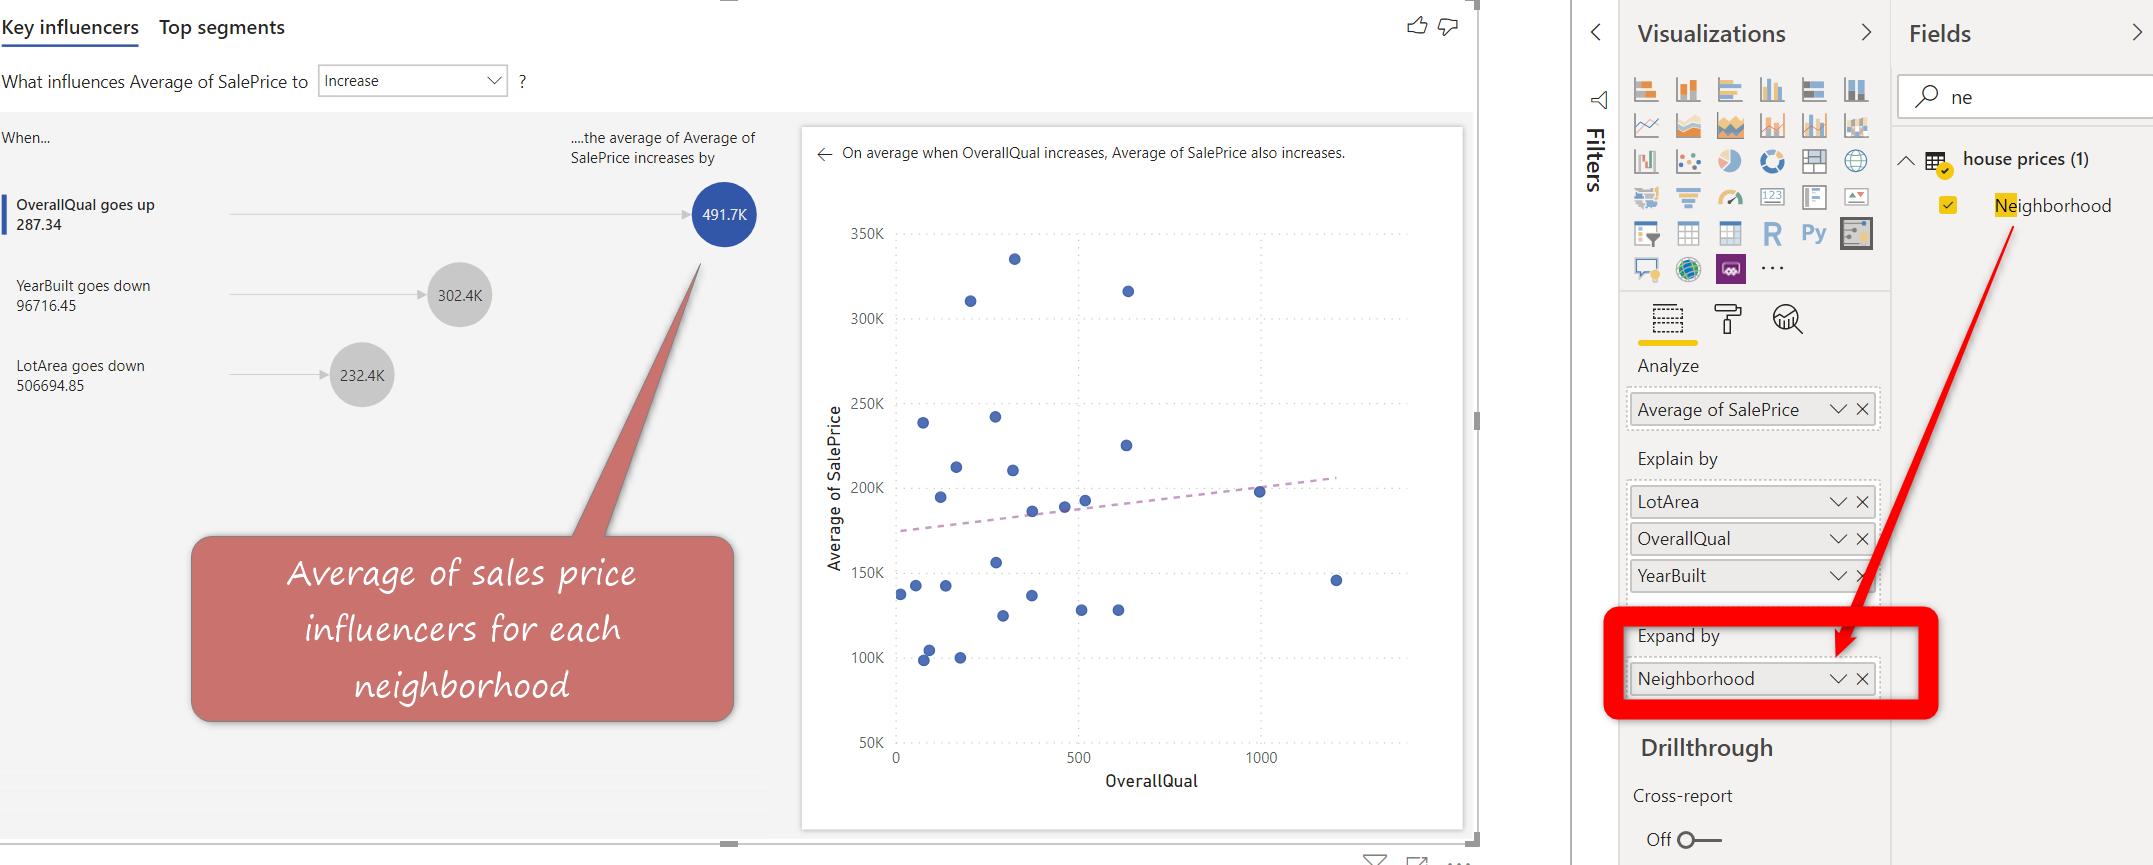 power quality application data analytics